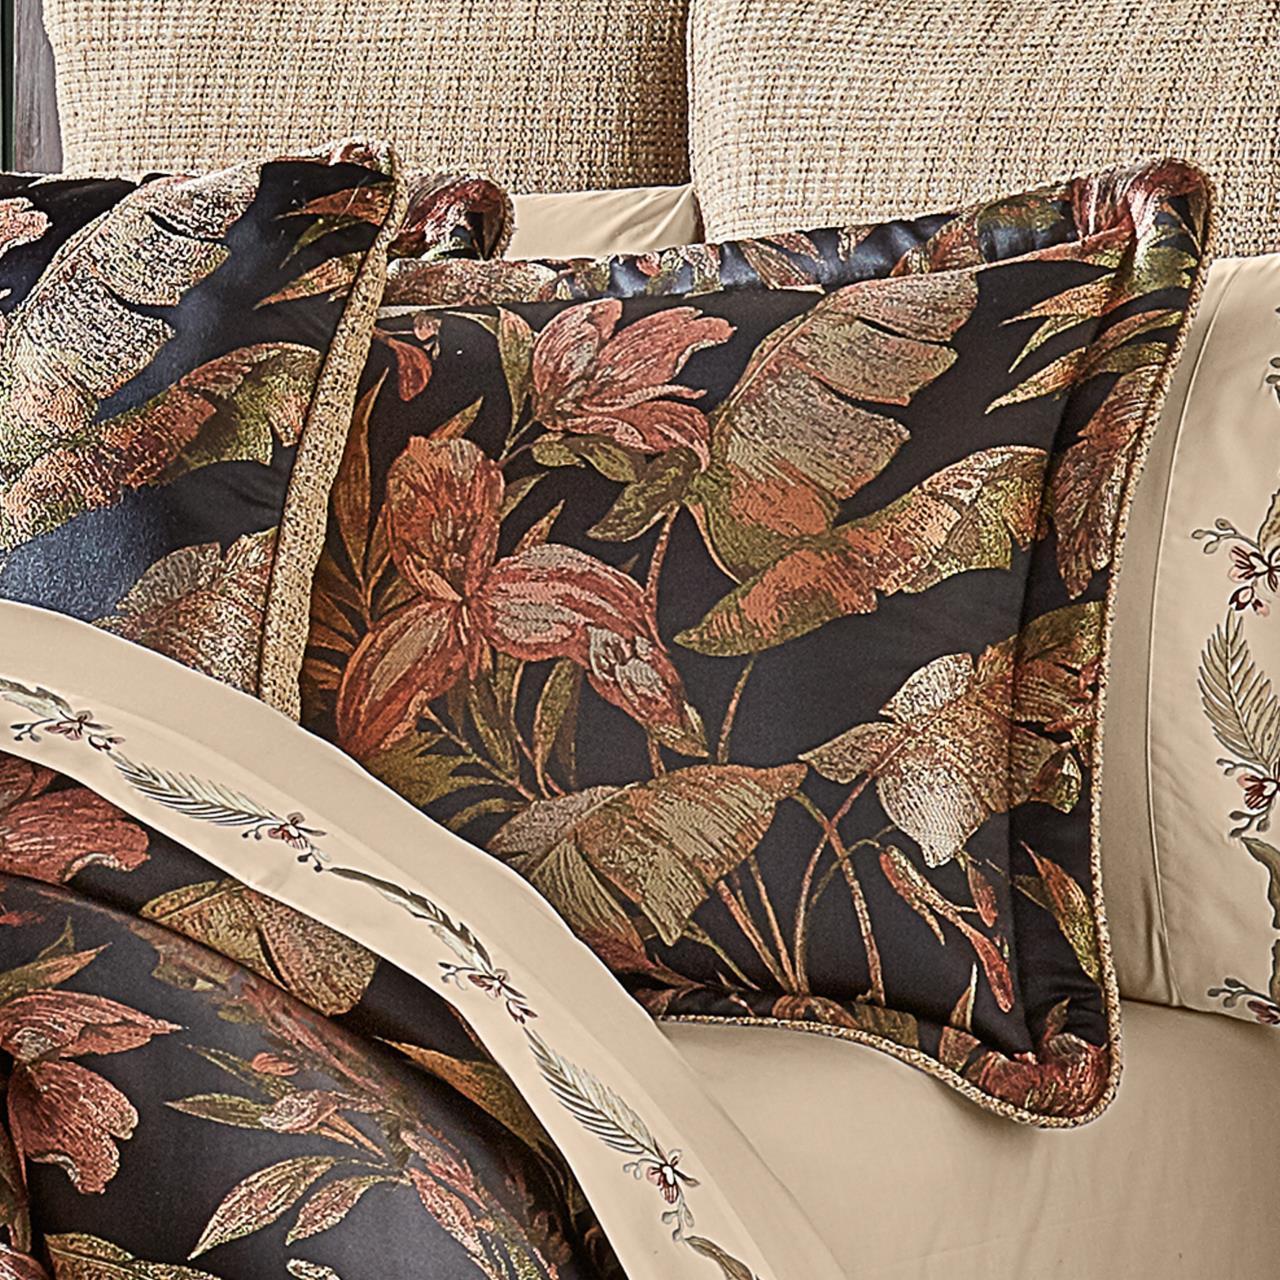 Martinique Black Comforter Collection -